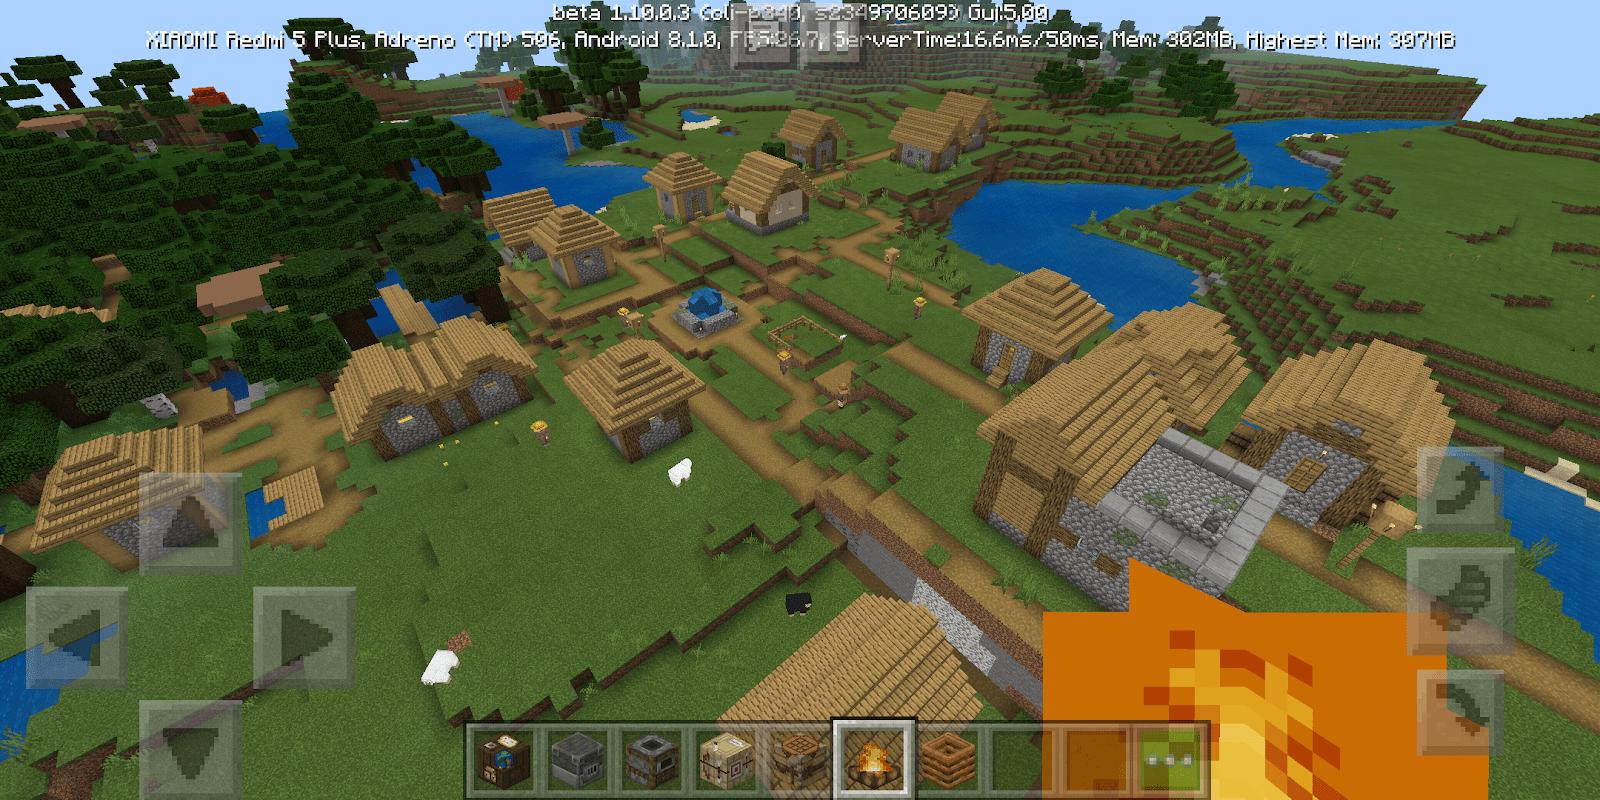 4. Minecraft